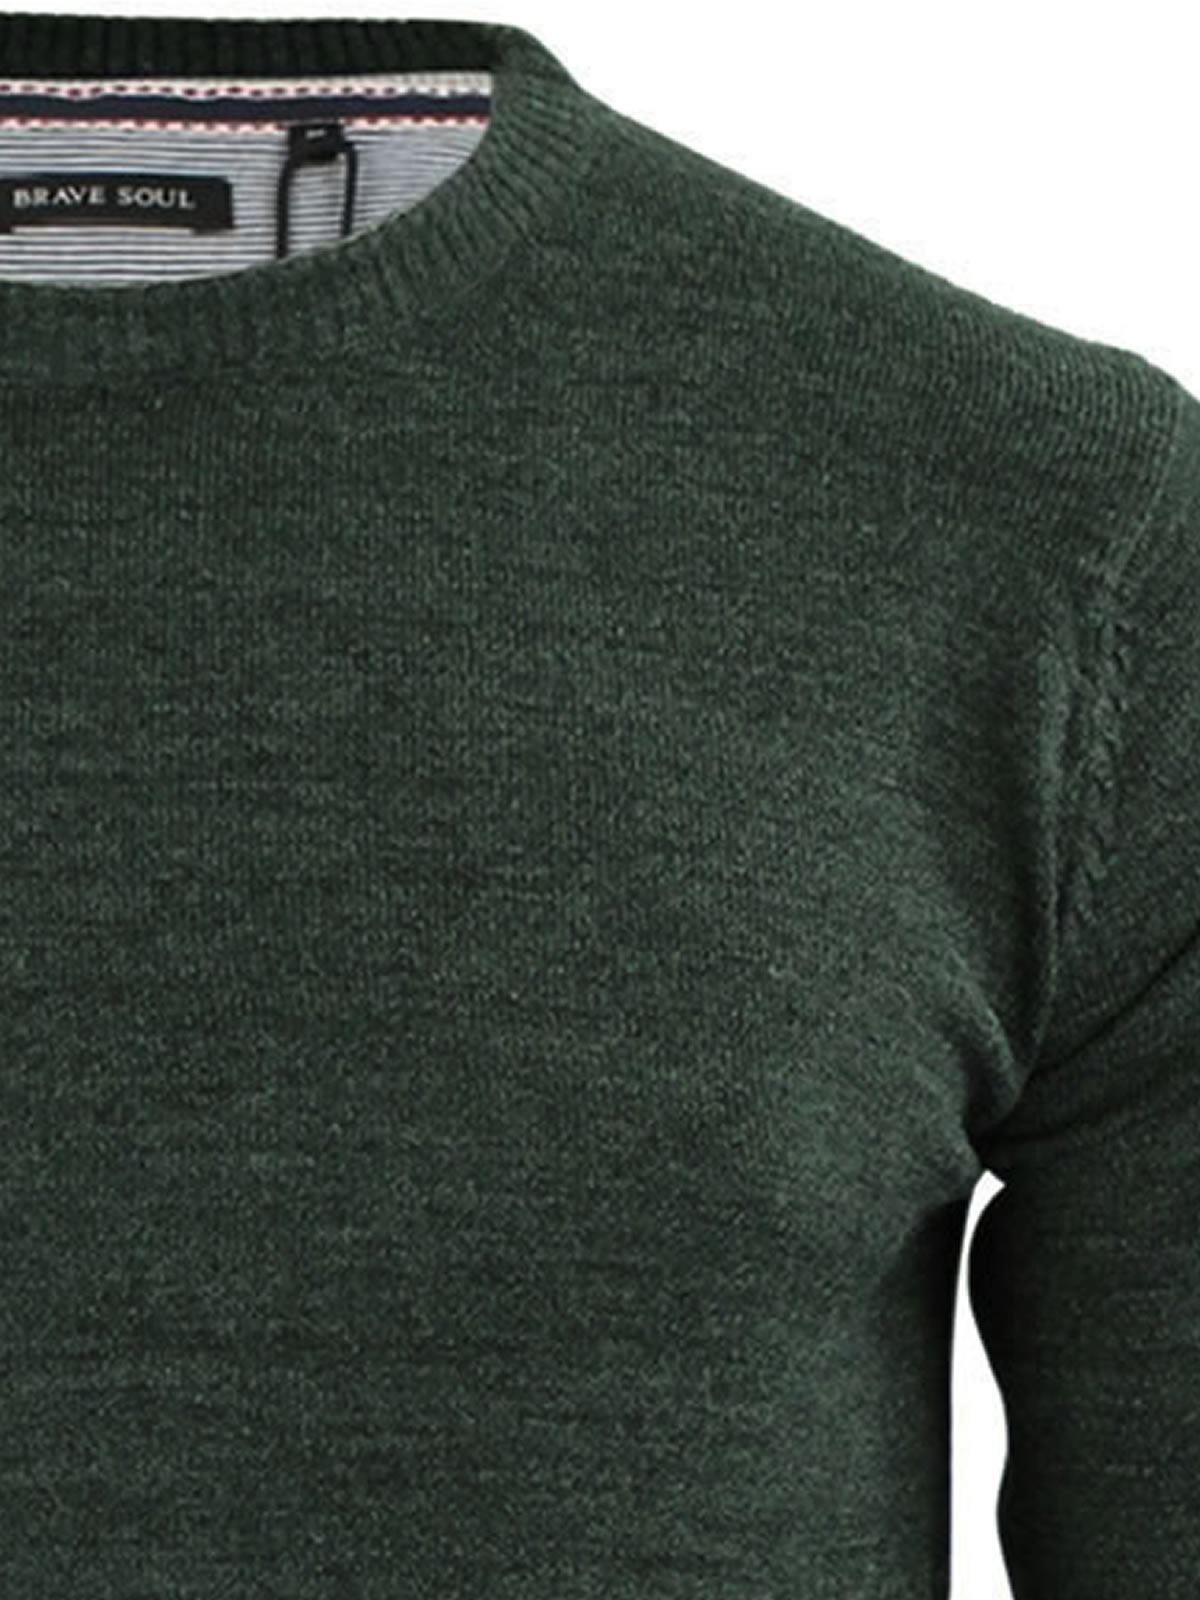 Brave-Soul-Urbain-Mens-Jumper-Knitted-Crew-Neck-Sweater thumbnail 21